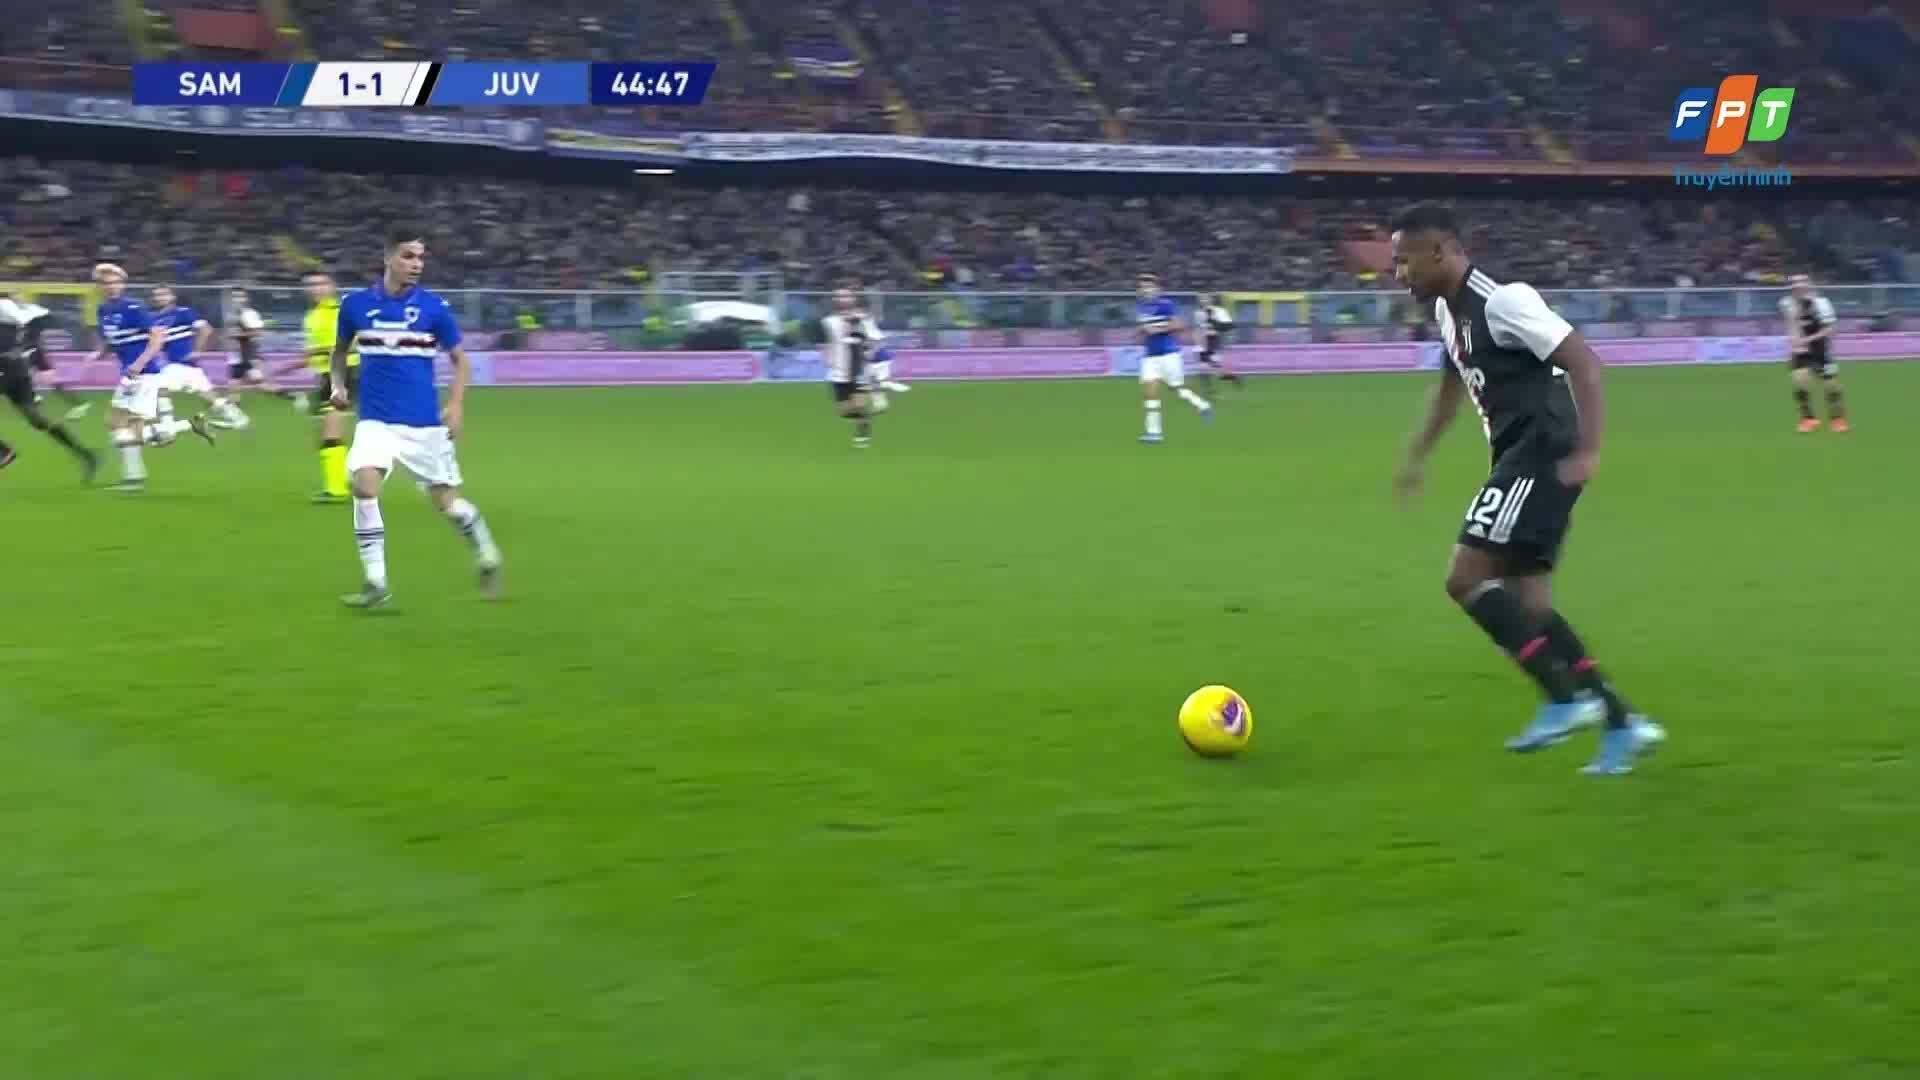 Pha ghi bàn của Ronaldo